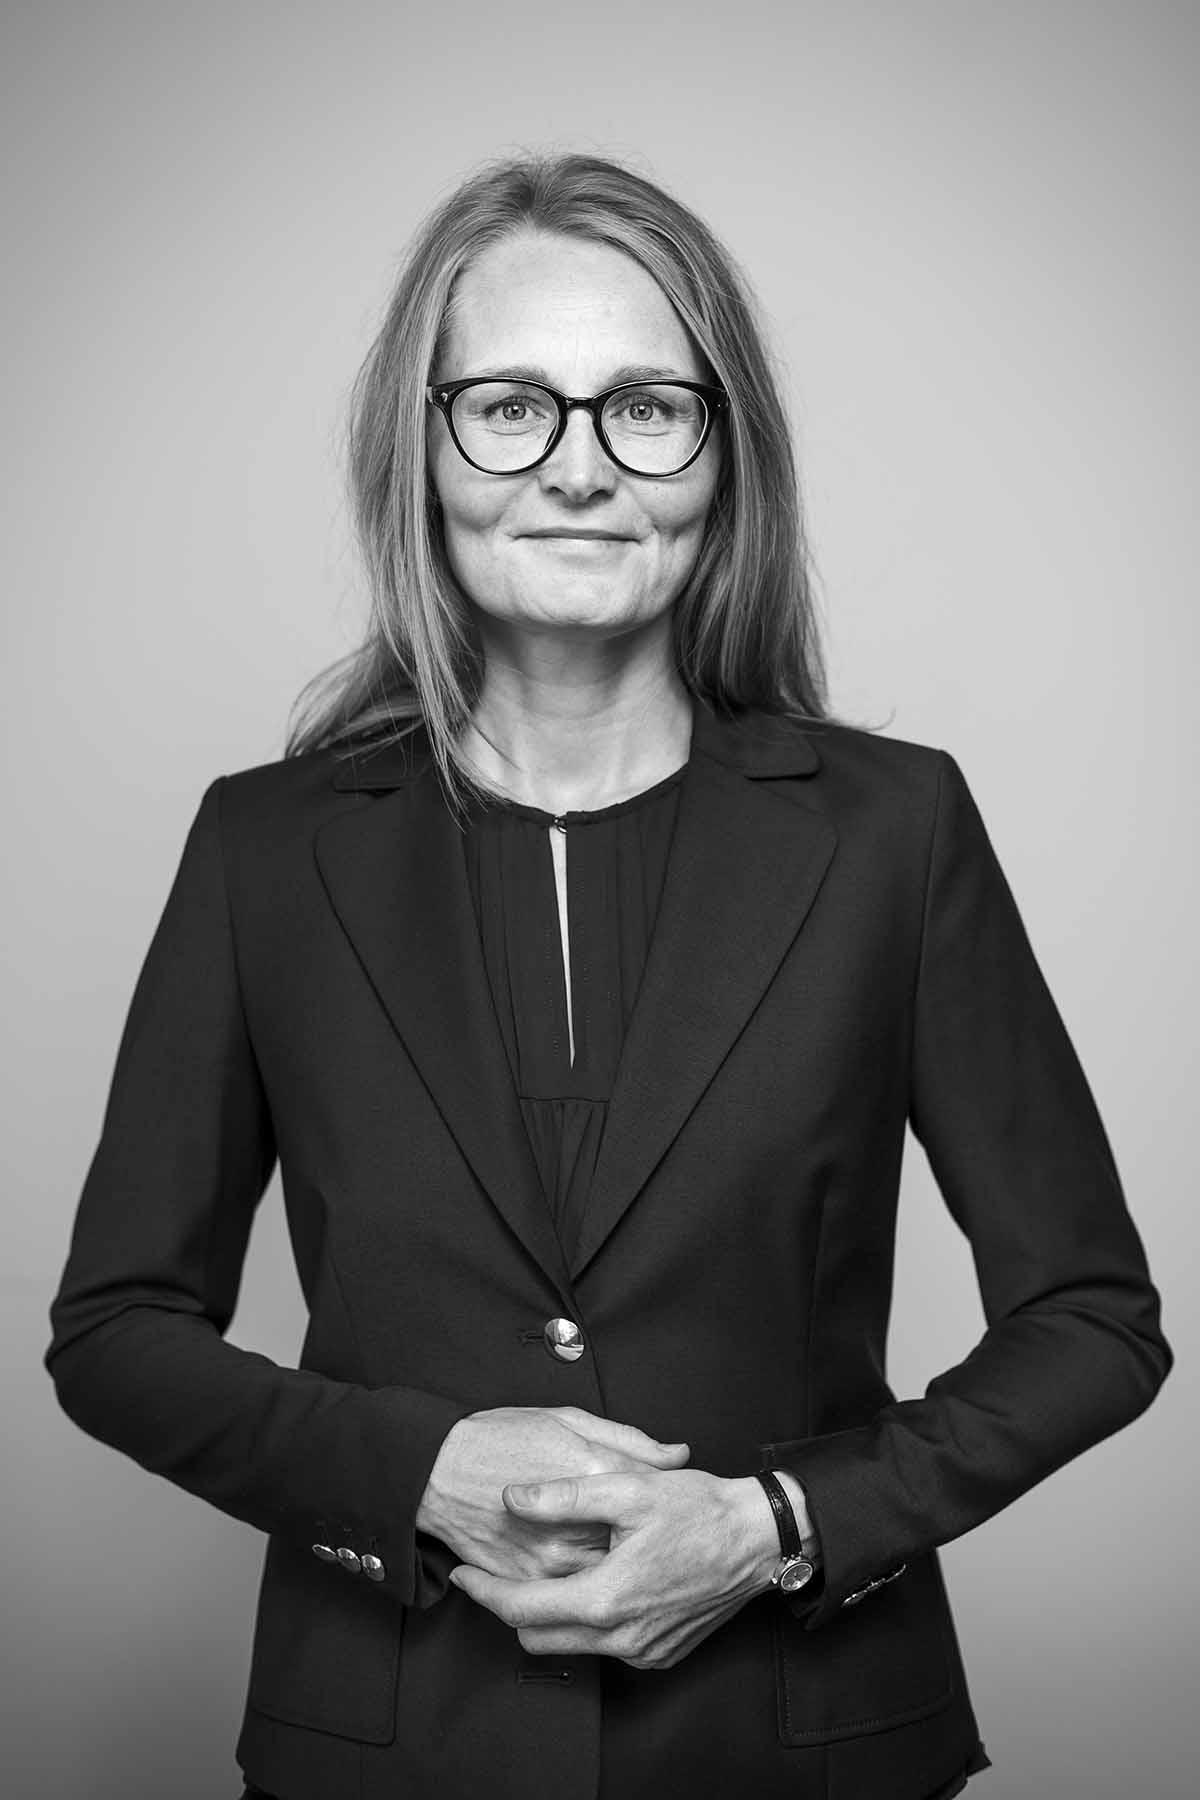 forfatter portræt Sønderborg